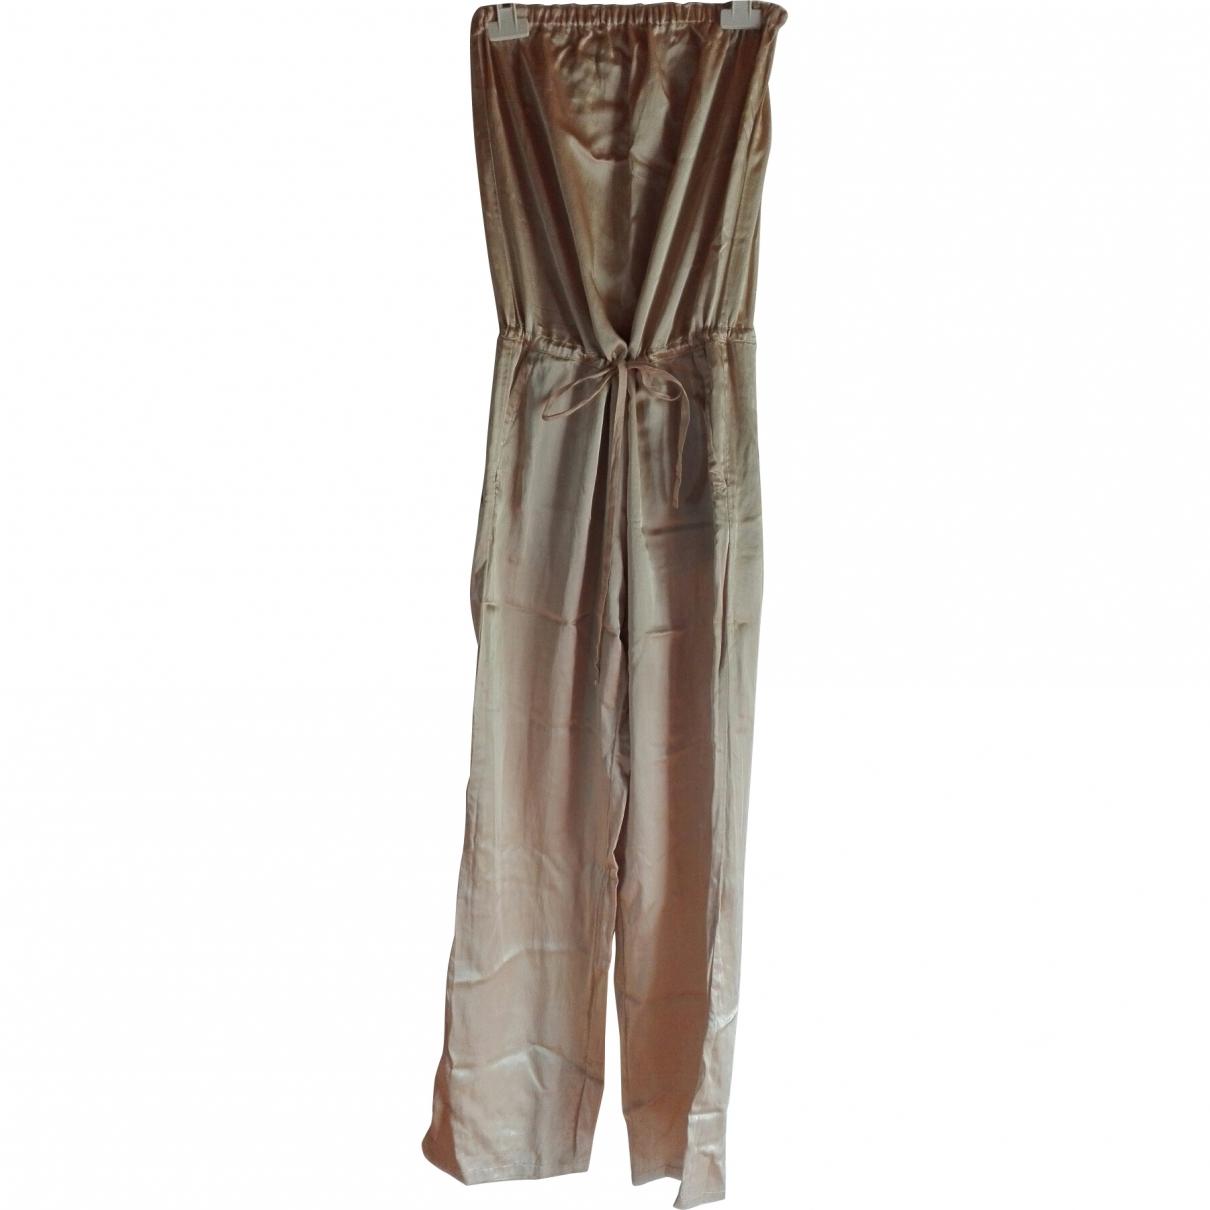 Mm6 \N Gold jumpsuit for Women 40 FR